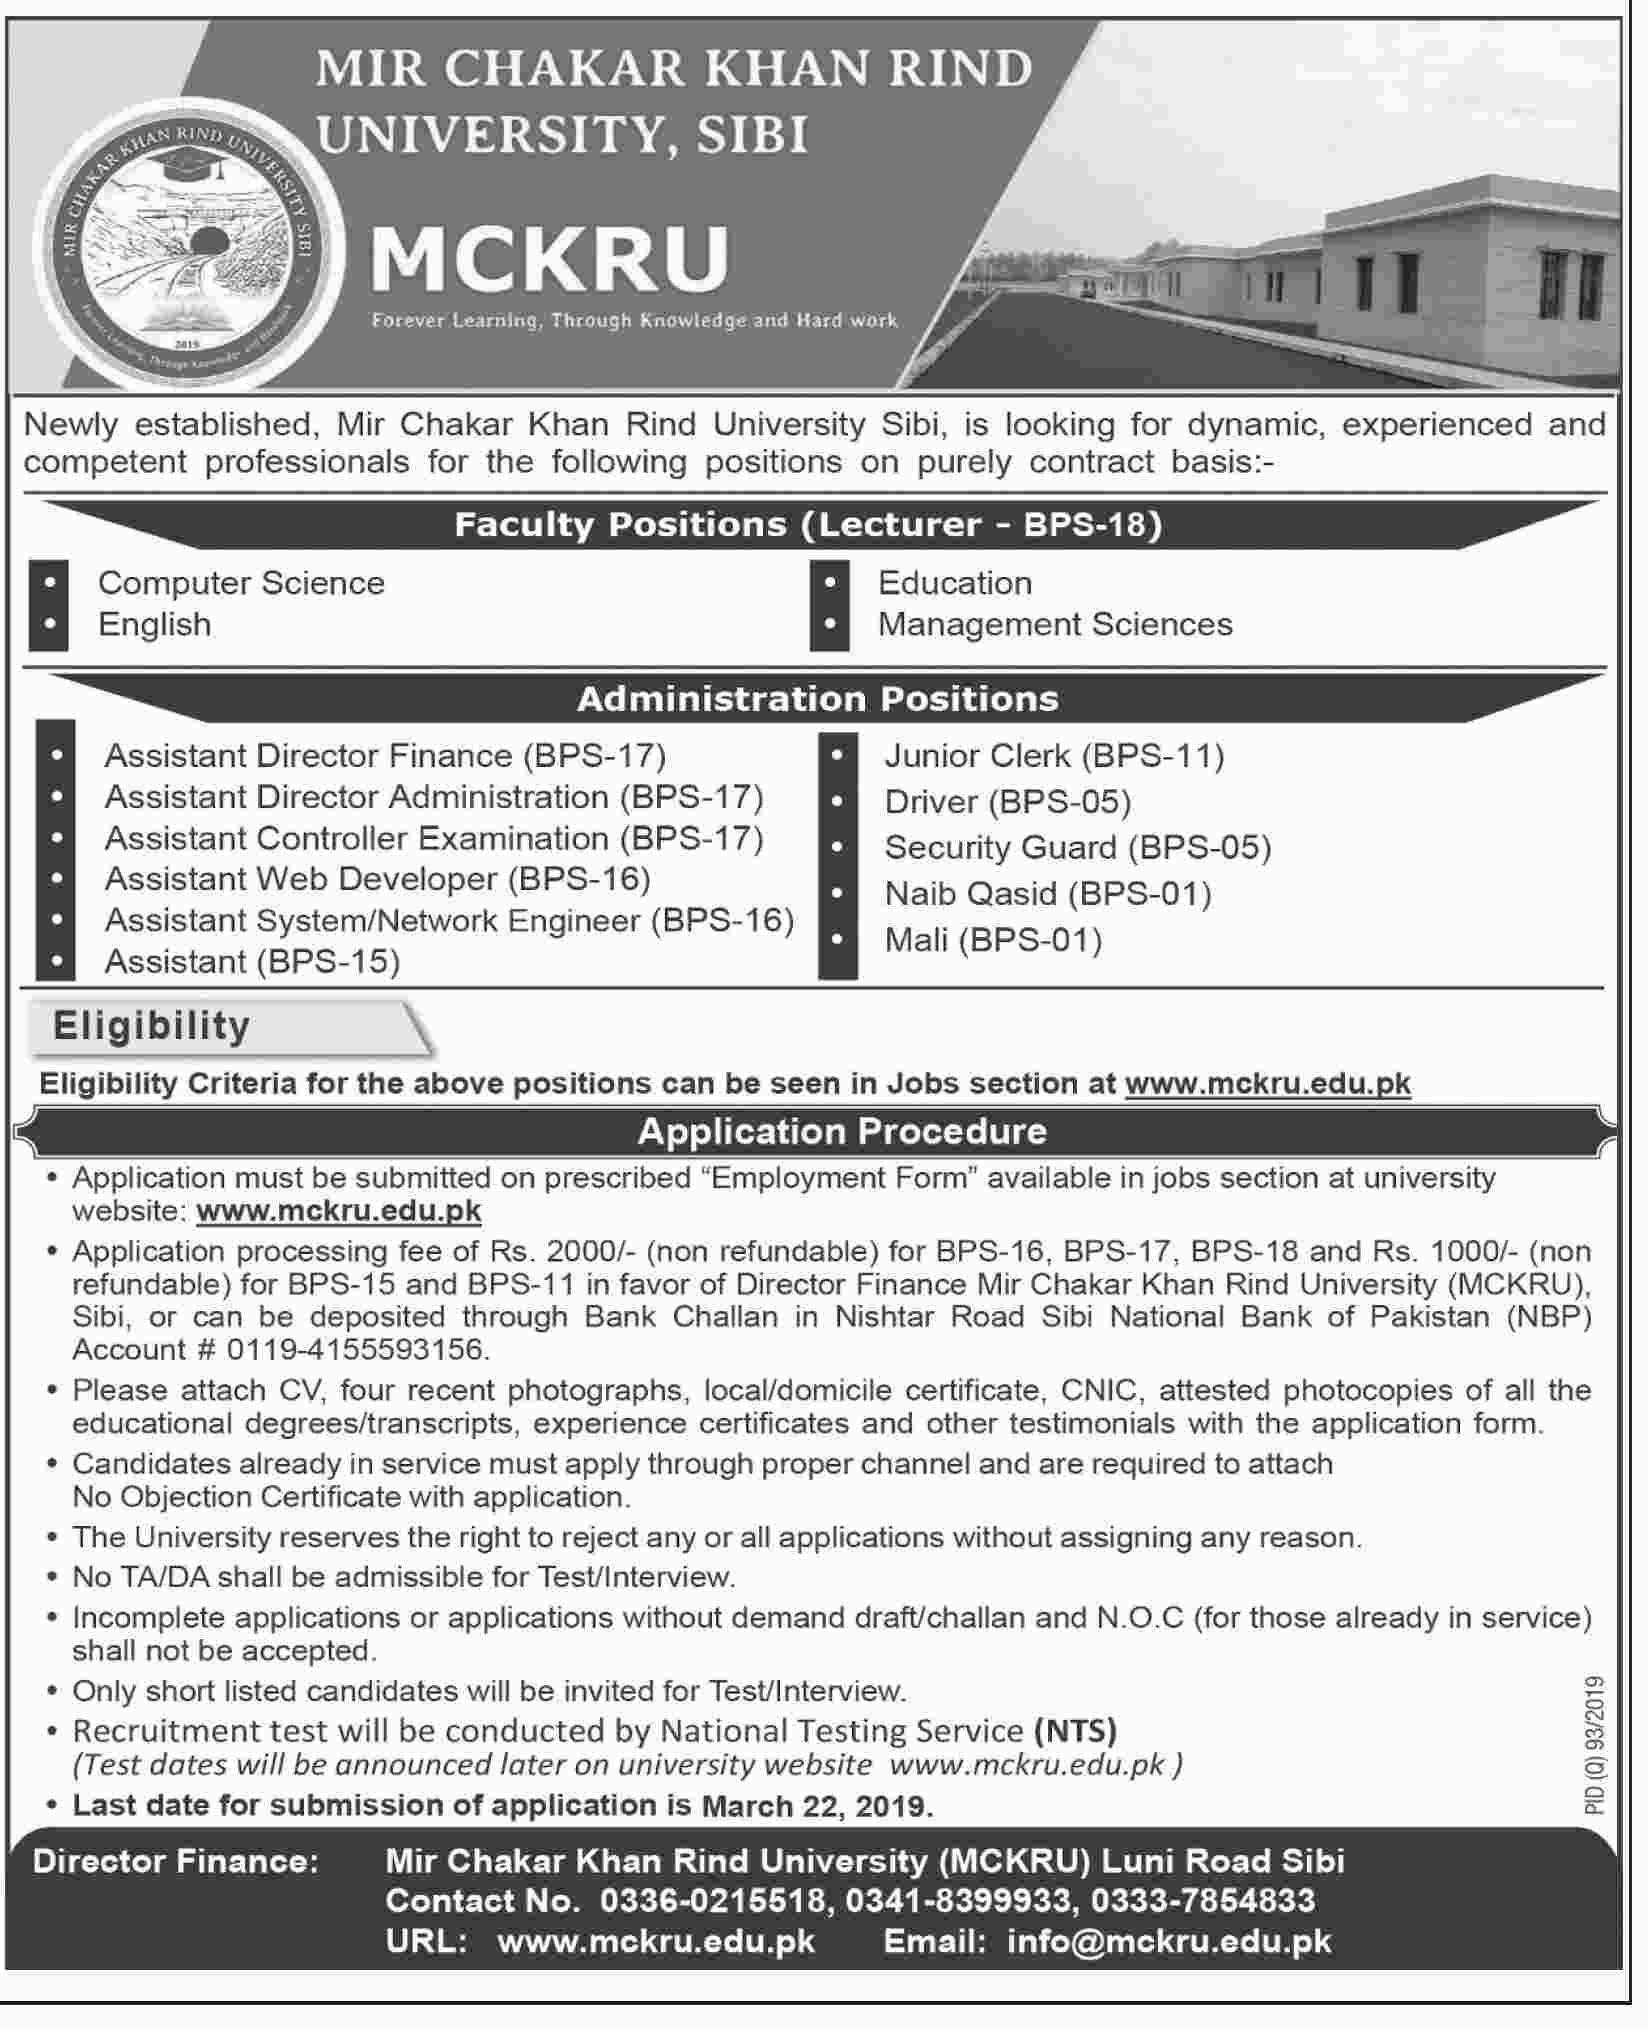 Mir Chakar Khan Rind University MCKRU Sibbi Jobs 2019 NTS Application Form